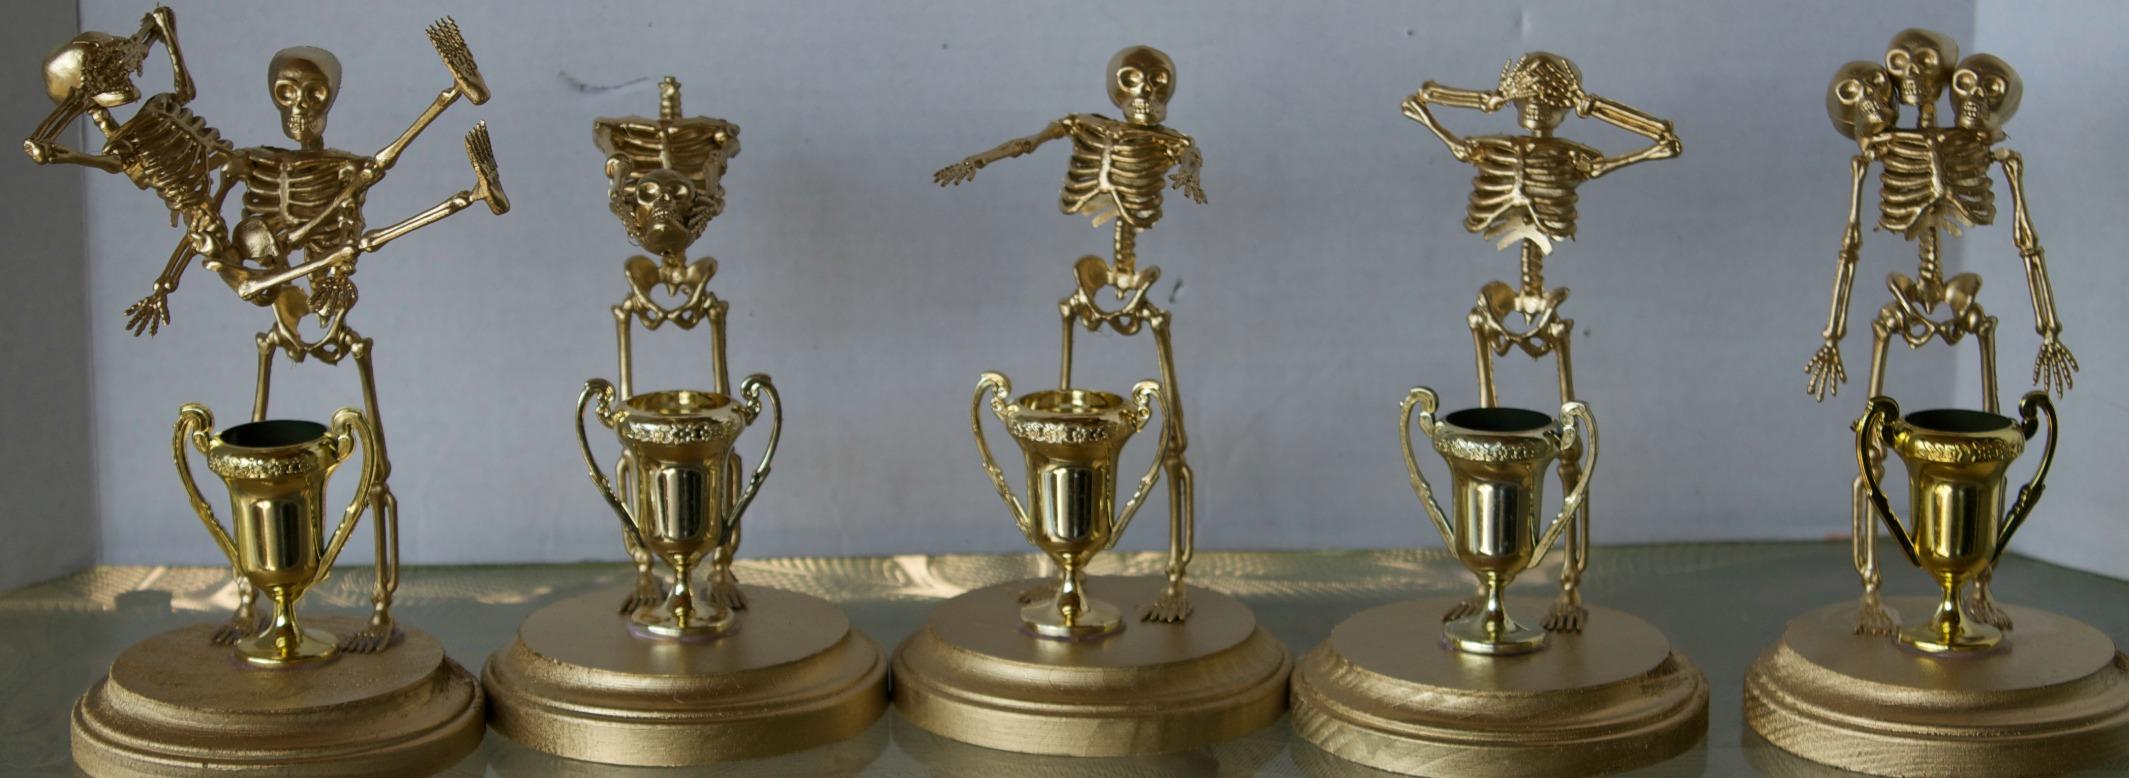 DIY Halloween awards